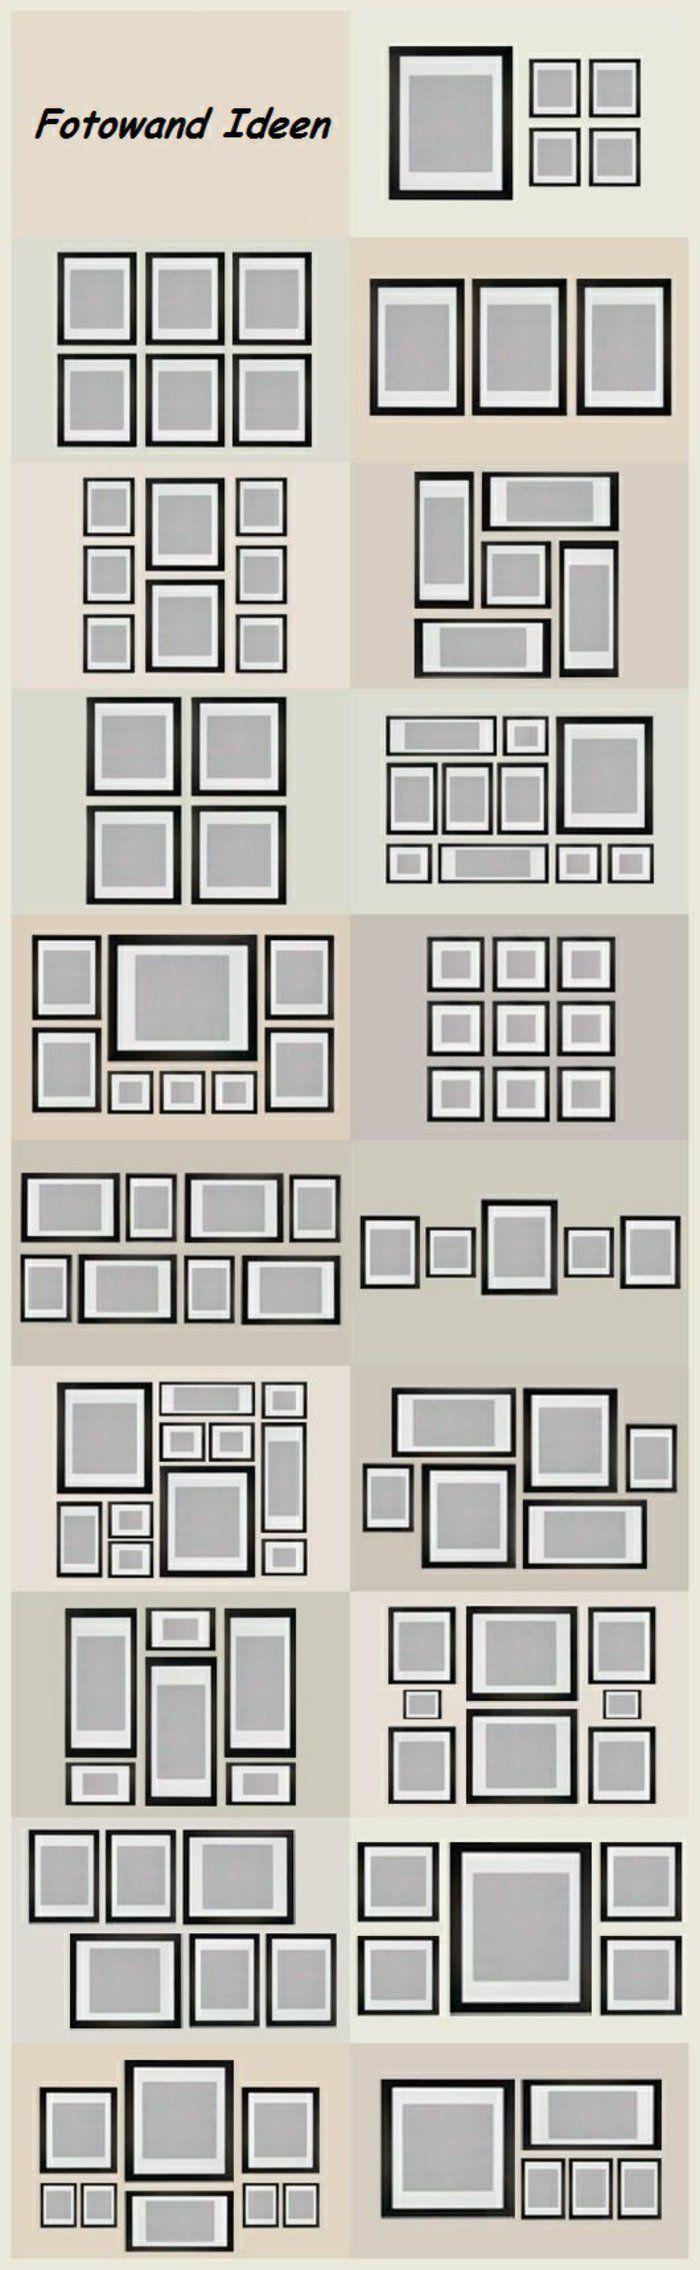 Bilder an der Wand anordnen #homedecor #homedesign #homeideas   #eine #Fotowand #für #home decor ideas #Ideen #Kreative #machen #selber #Wandgestaltung